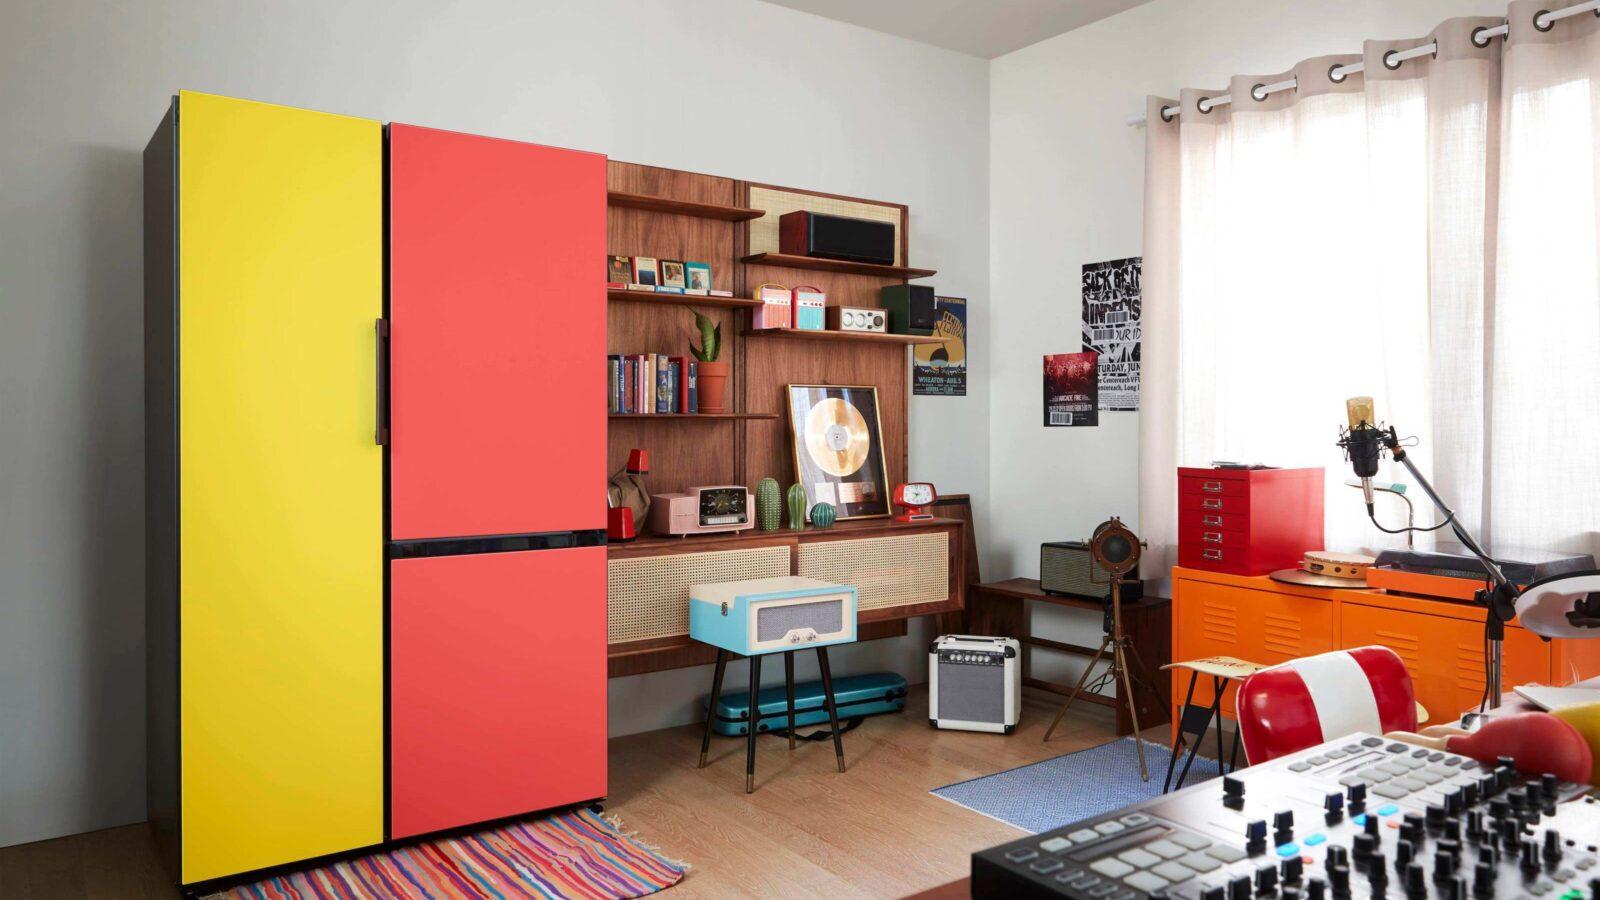 Samsung BESPOKE refrigerators